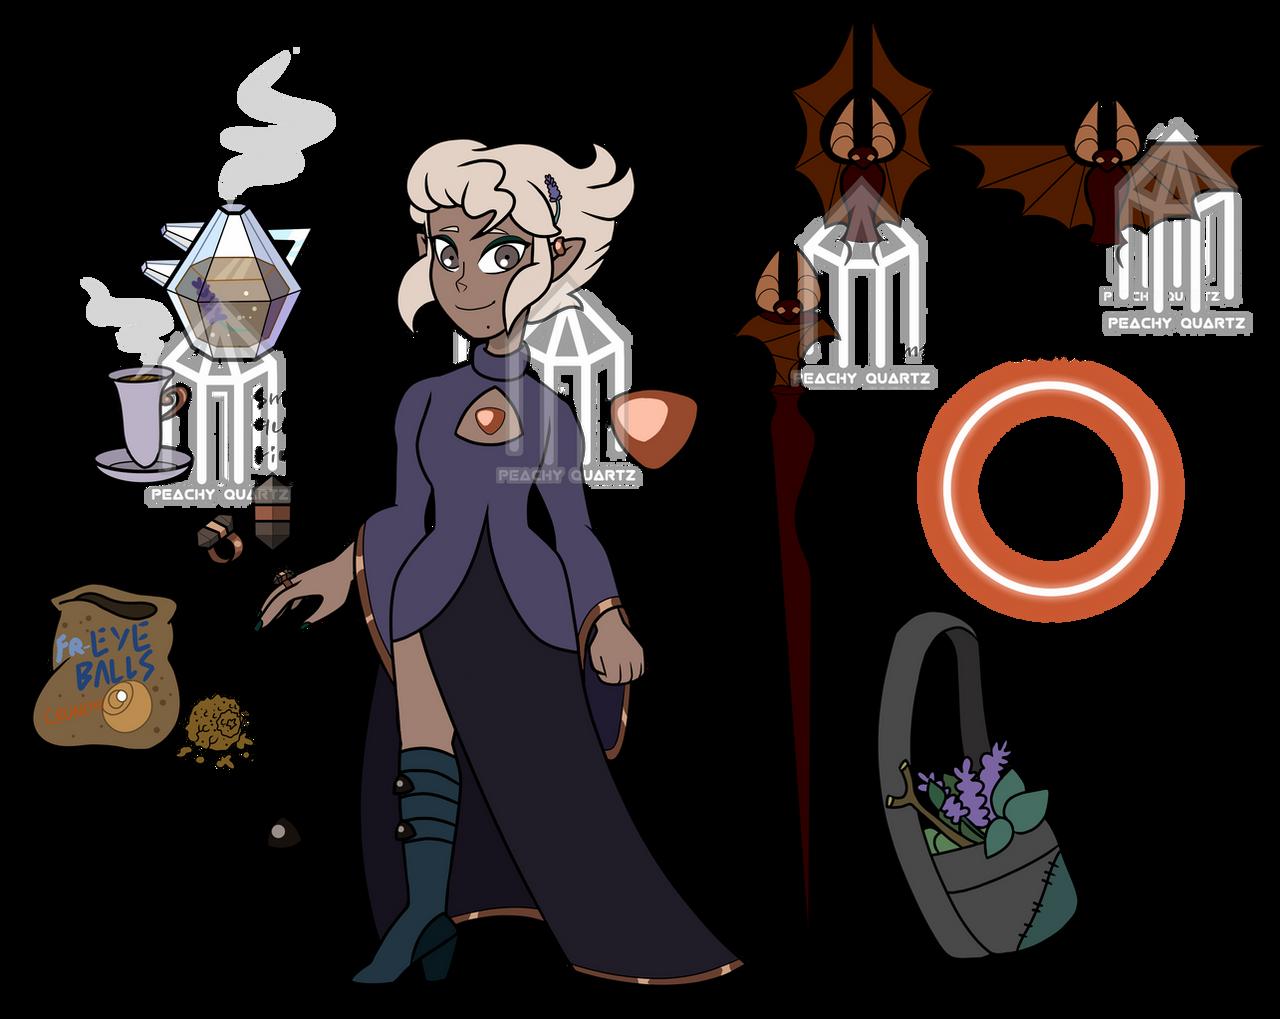 The Owl House Oc Amala By Tinylittledeer On Deviantart Owl House Character Design Character Design Inspiration